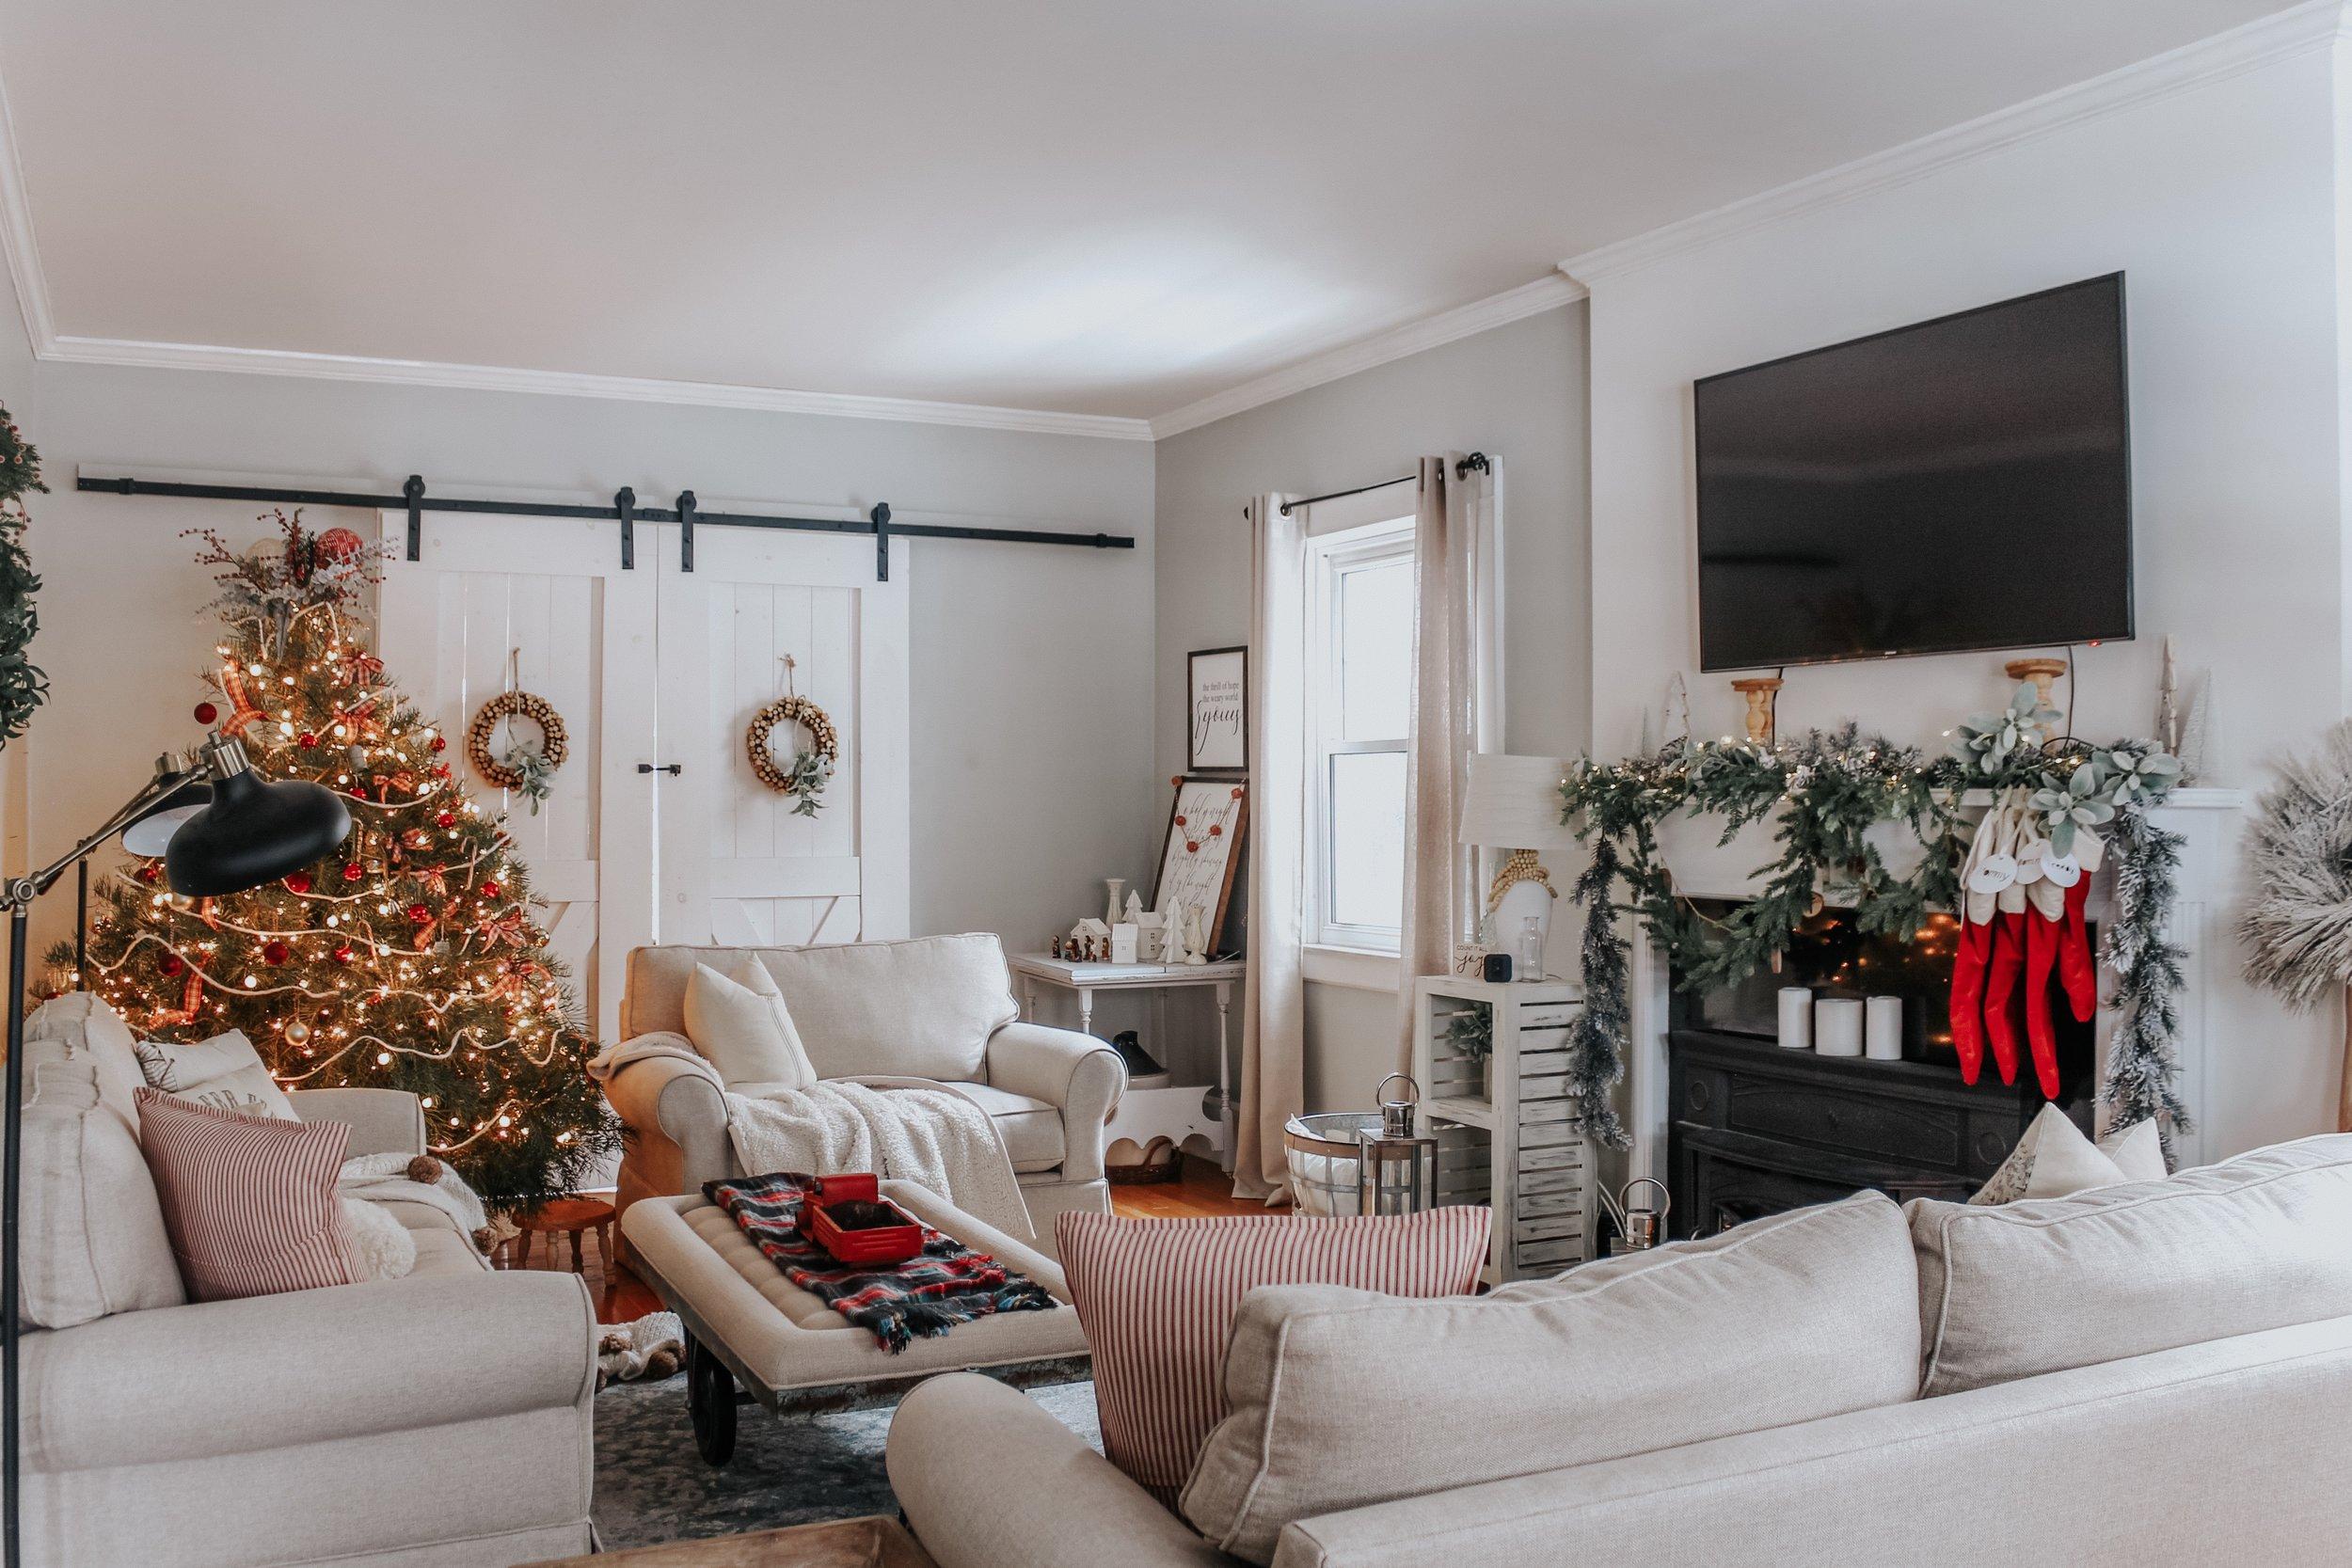 Christmas Fireplace and living room